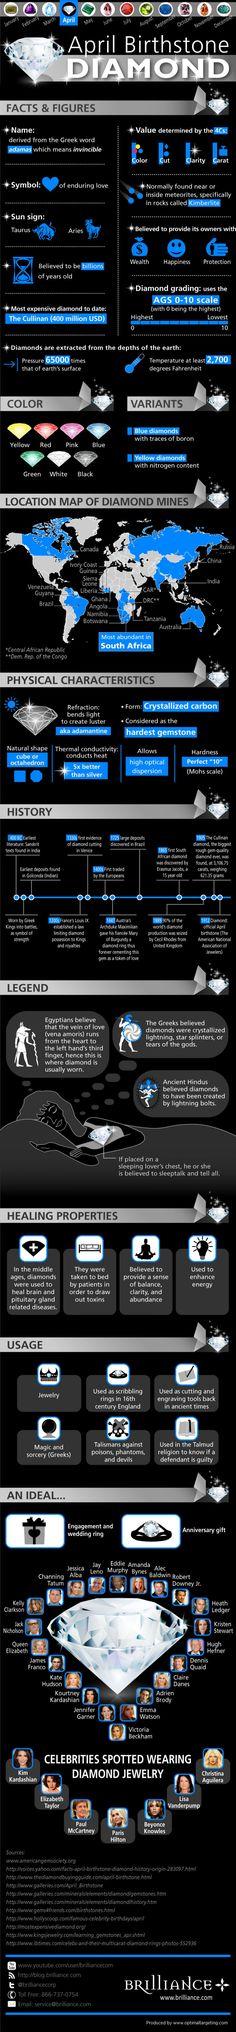 Diamond, The Birthstone of April Infographic